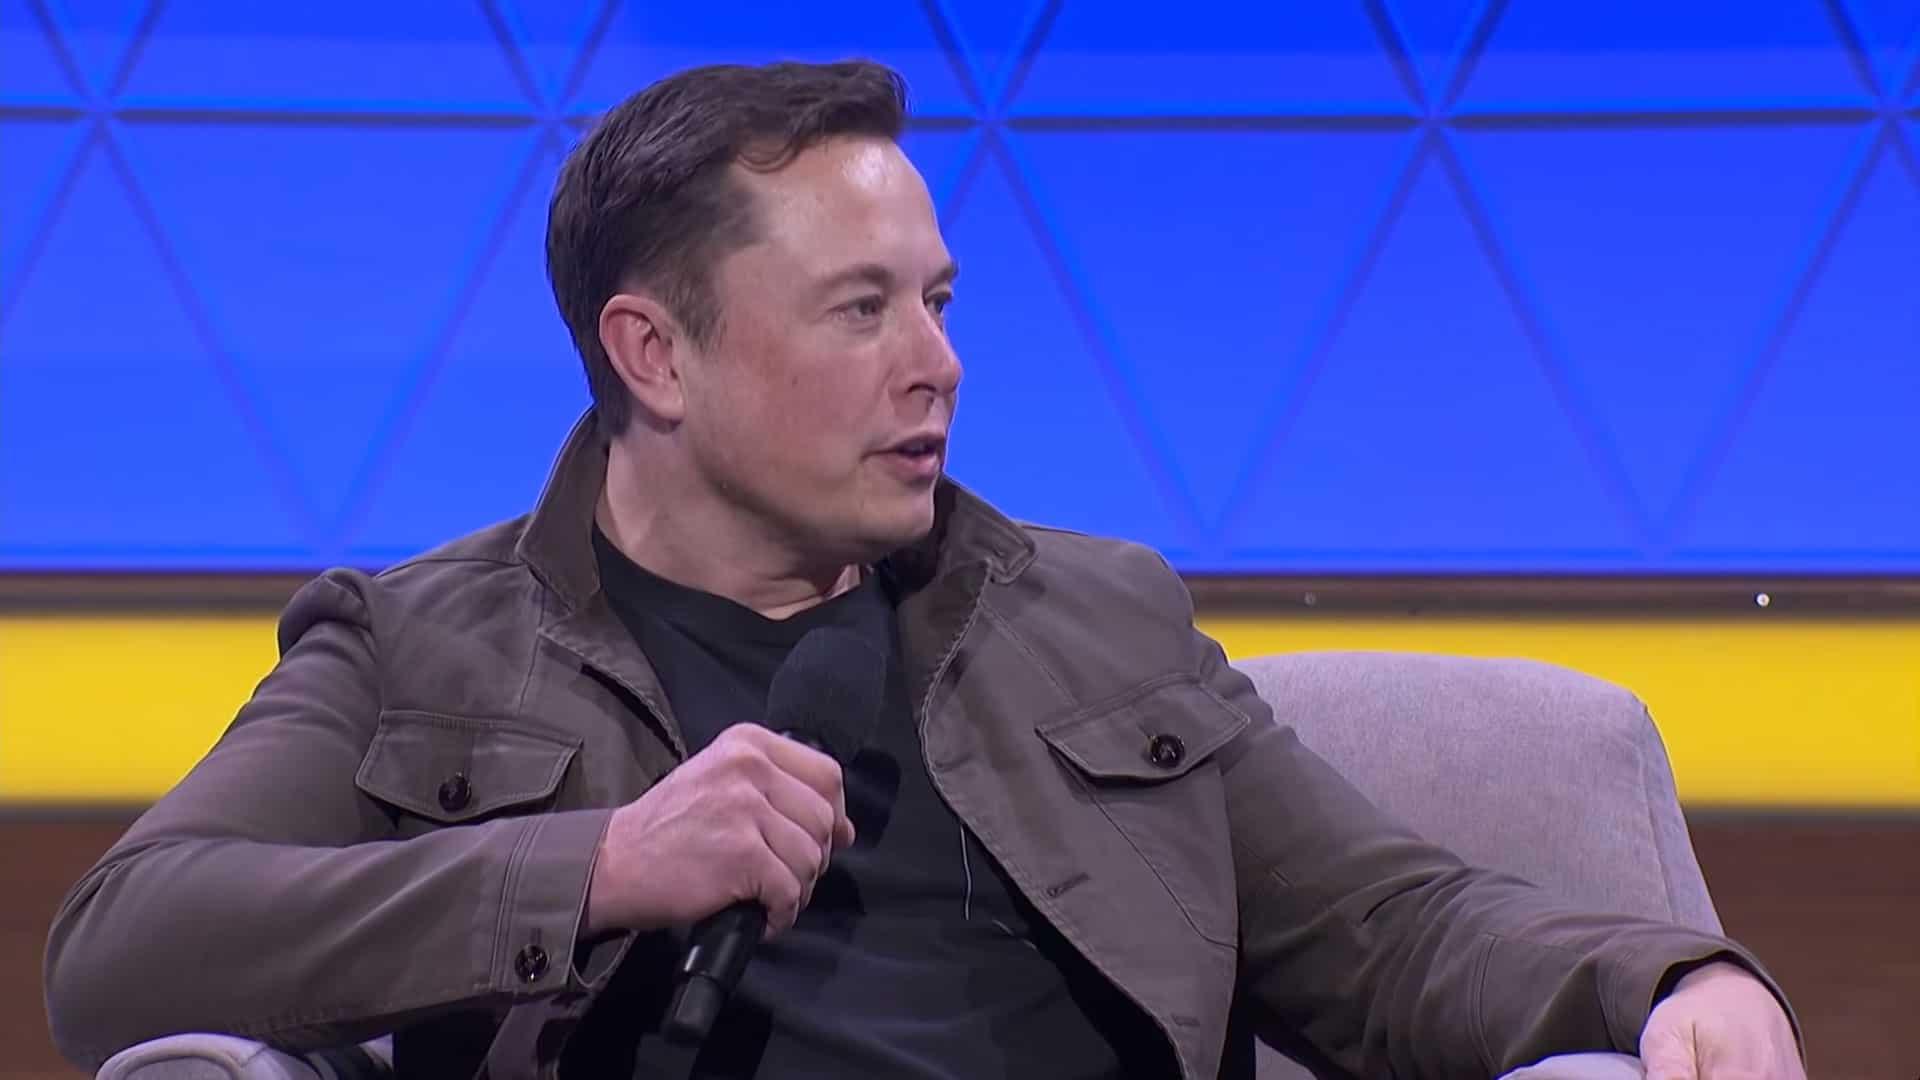 Elon Musk at E3 2019